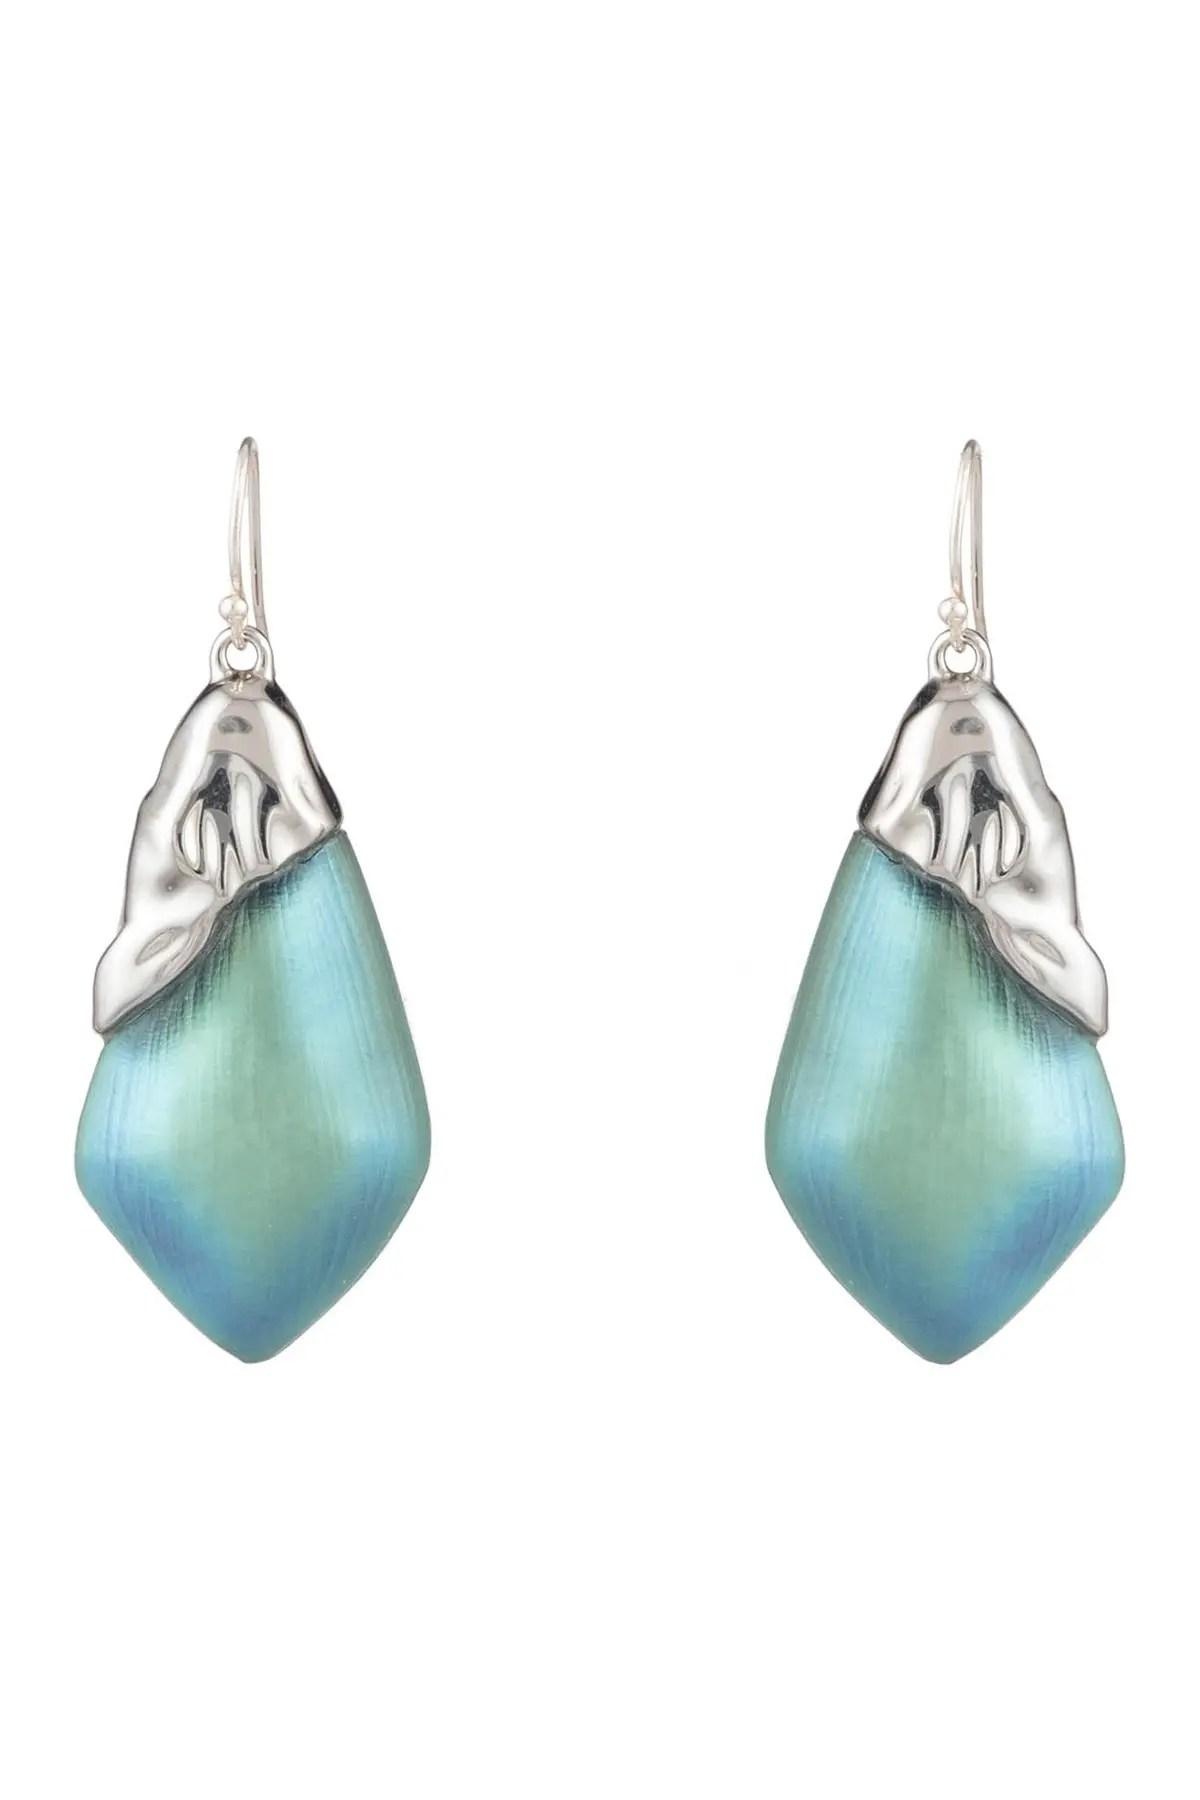 alexis bittar rhodium plated asymmetrical drop earrings nordstrom rack